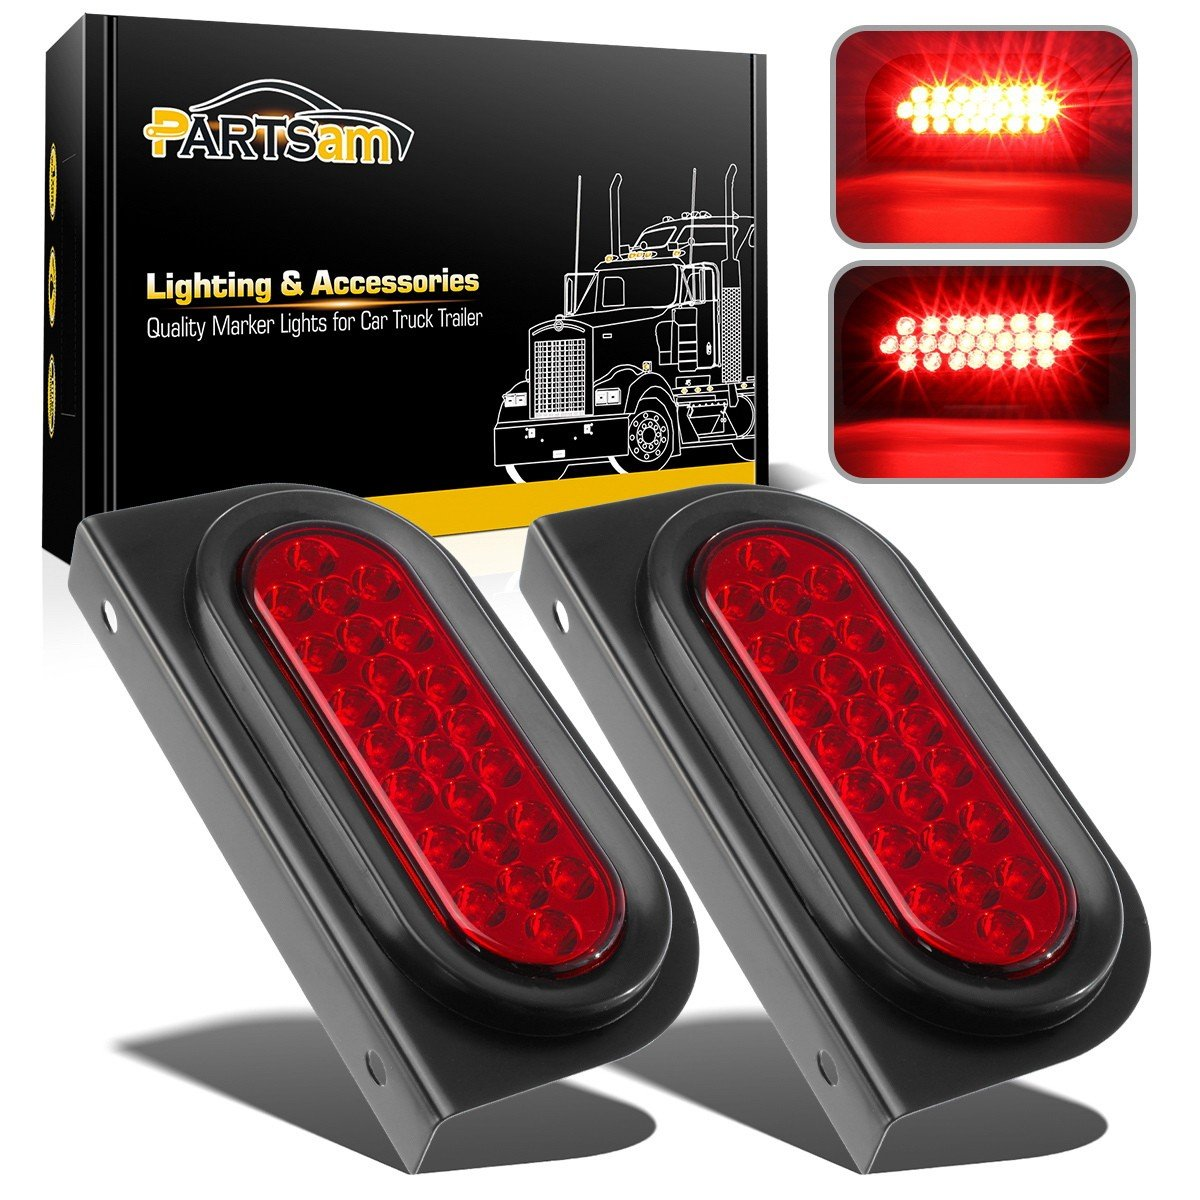 Partsam 2pcs Waterproof 6'' inch Oval Sealed Stop Turn Tail Brake Marker Red 24 LED Truck Trailer Light Kit Flush Mount w/Mounting Brackets by Partsam